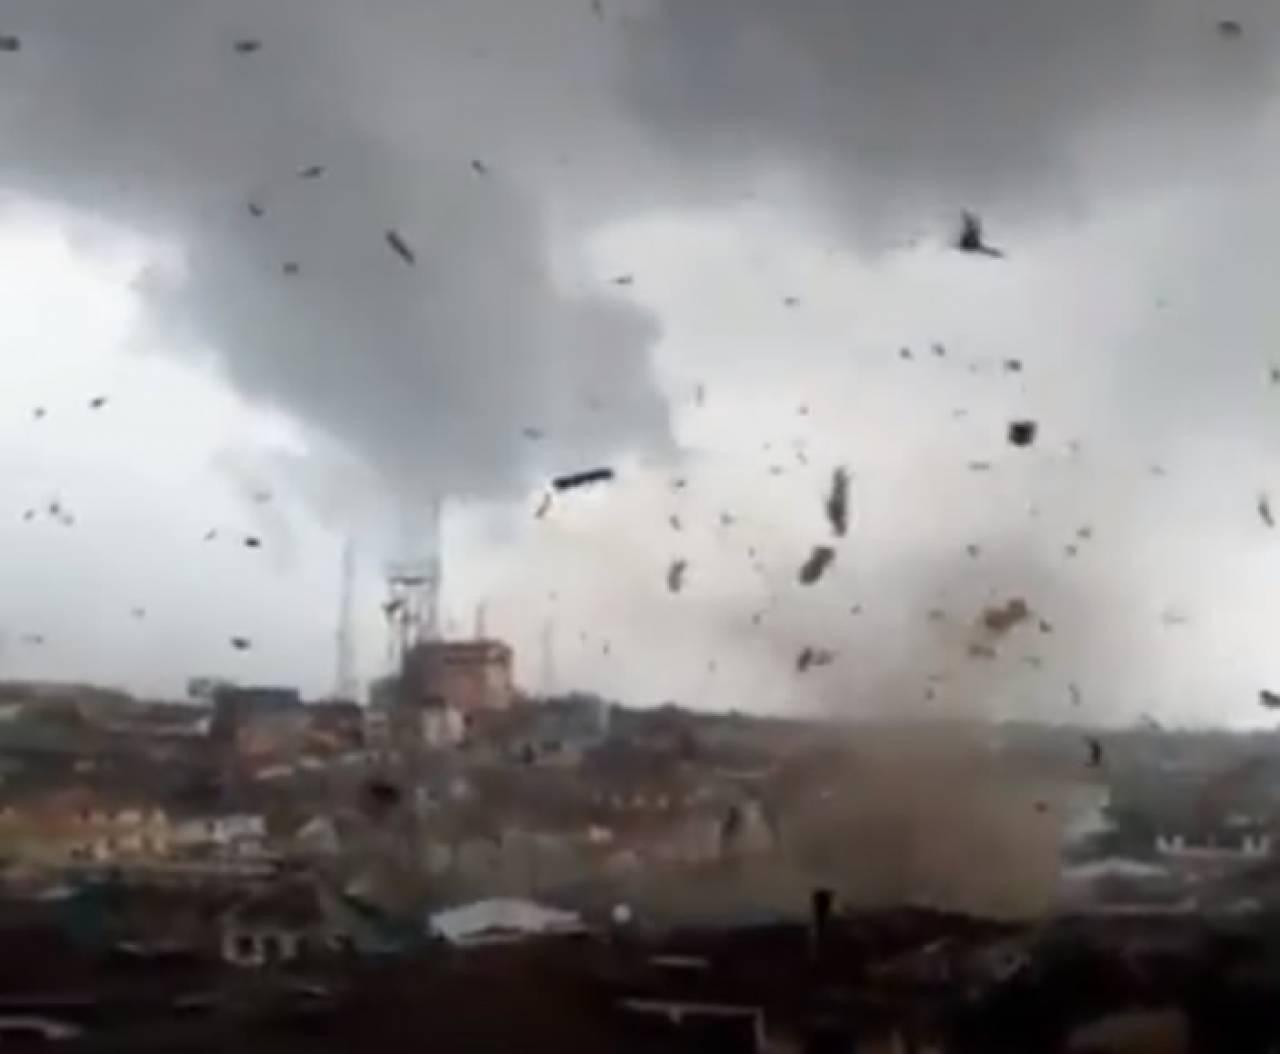 Africa - Tornado colpisce Ketu in Nigeria, molti danni. Tornado atipico anche in Guatemala. VIDEO